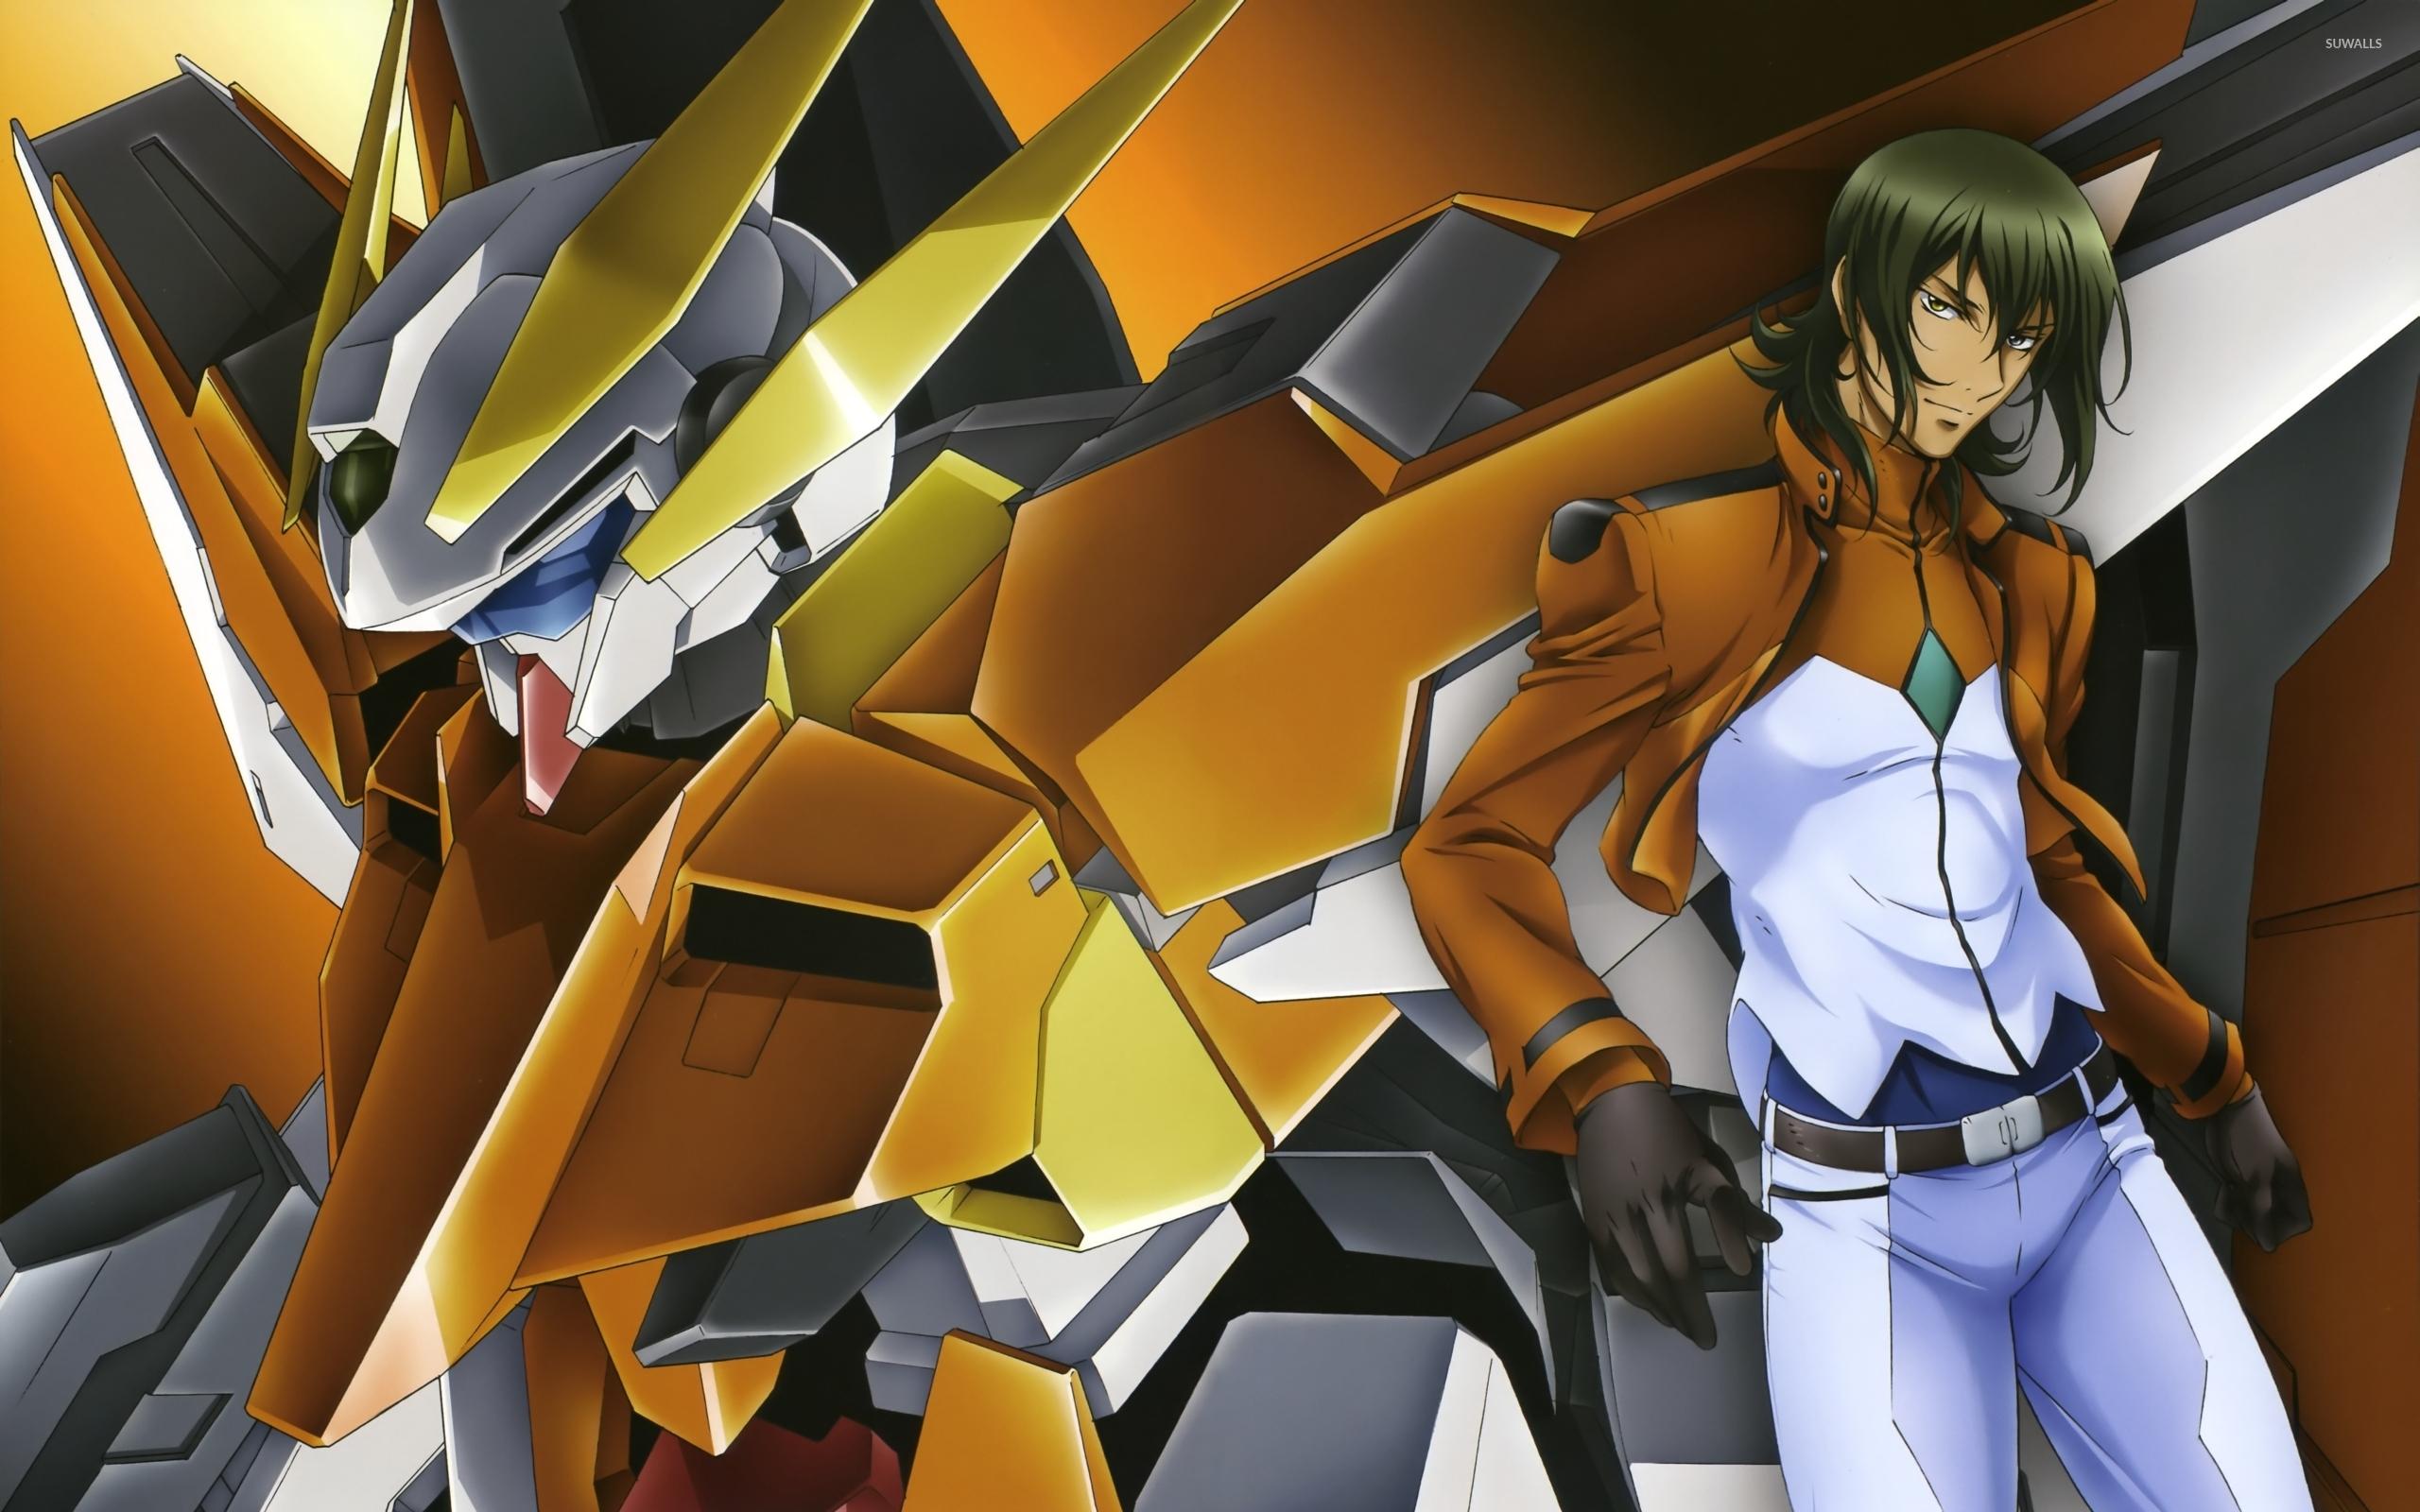 Mobile Suit Gundam 00 Wallpaper Anime Wallpapers 3784